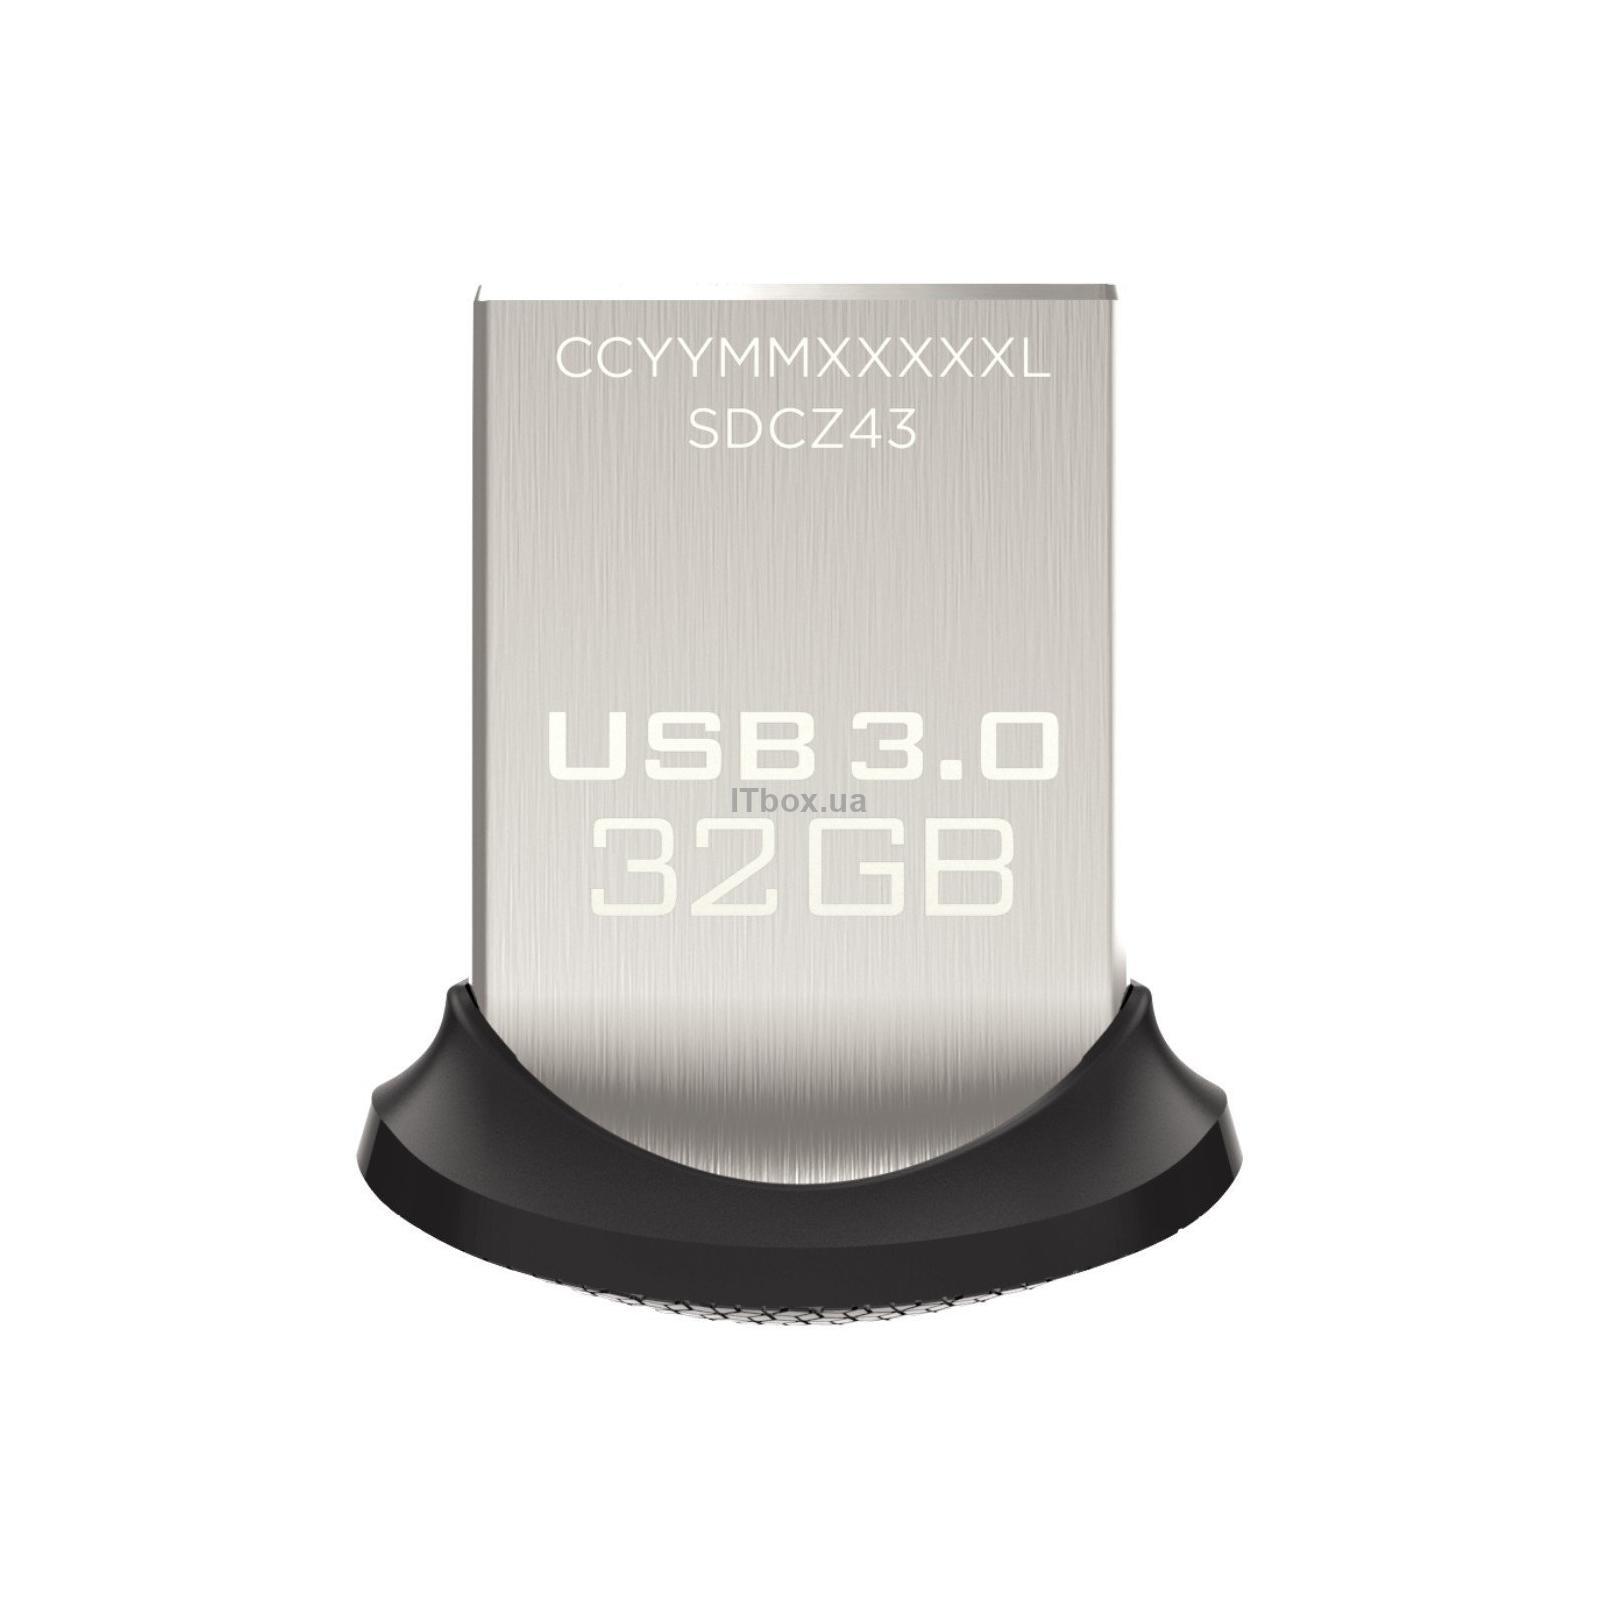 SANDISK 32GB Fit флеш USB Ultra   накопитель 3.0. Brain USB